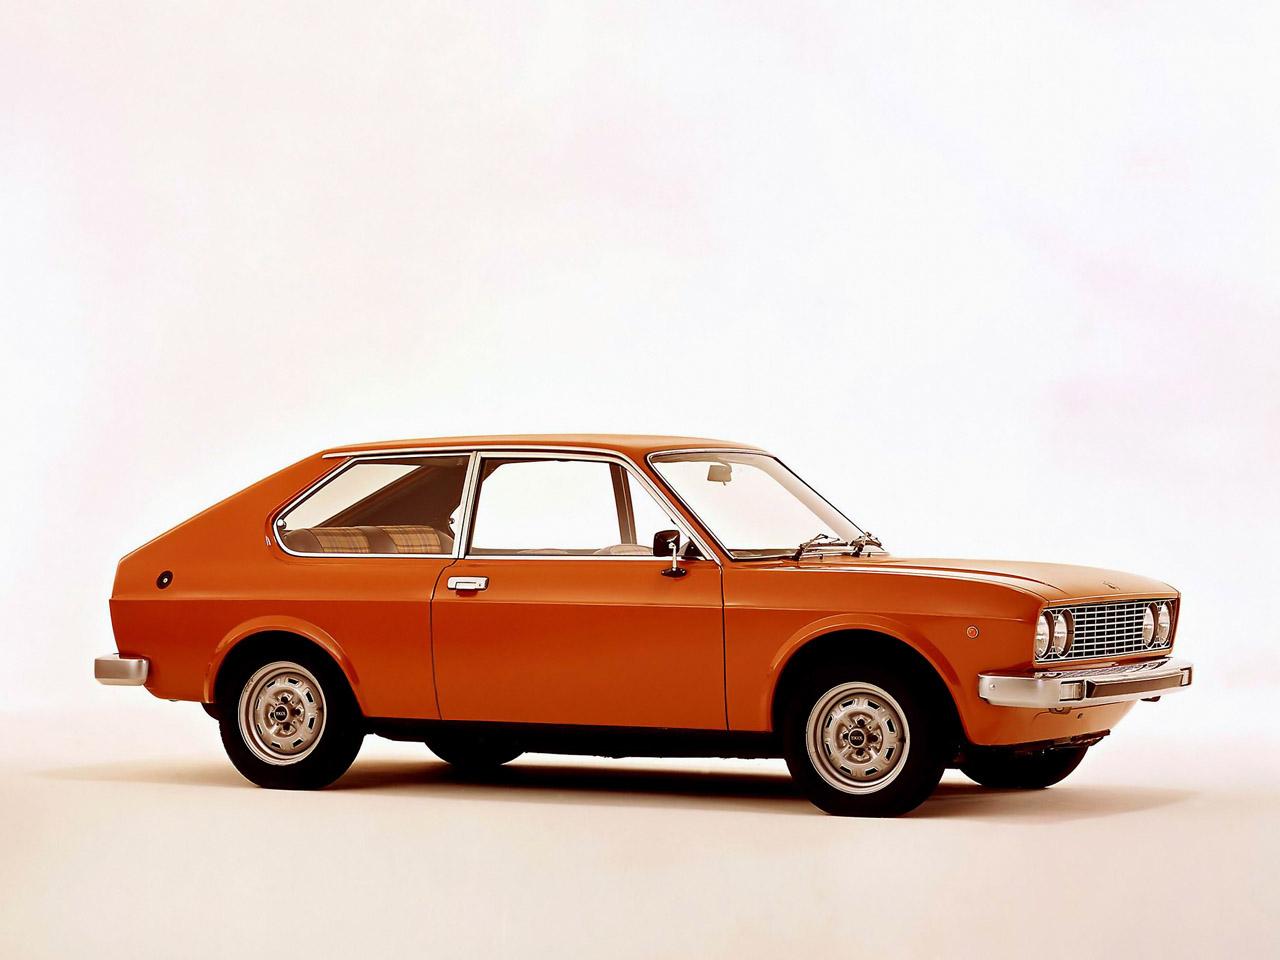 Fiat 128 Coupe' 3P - 1971/1975